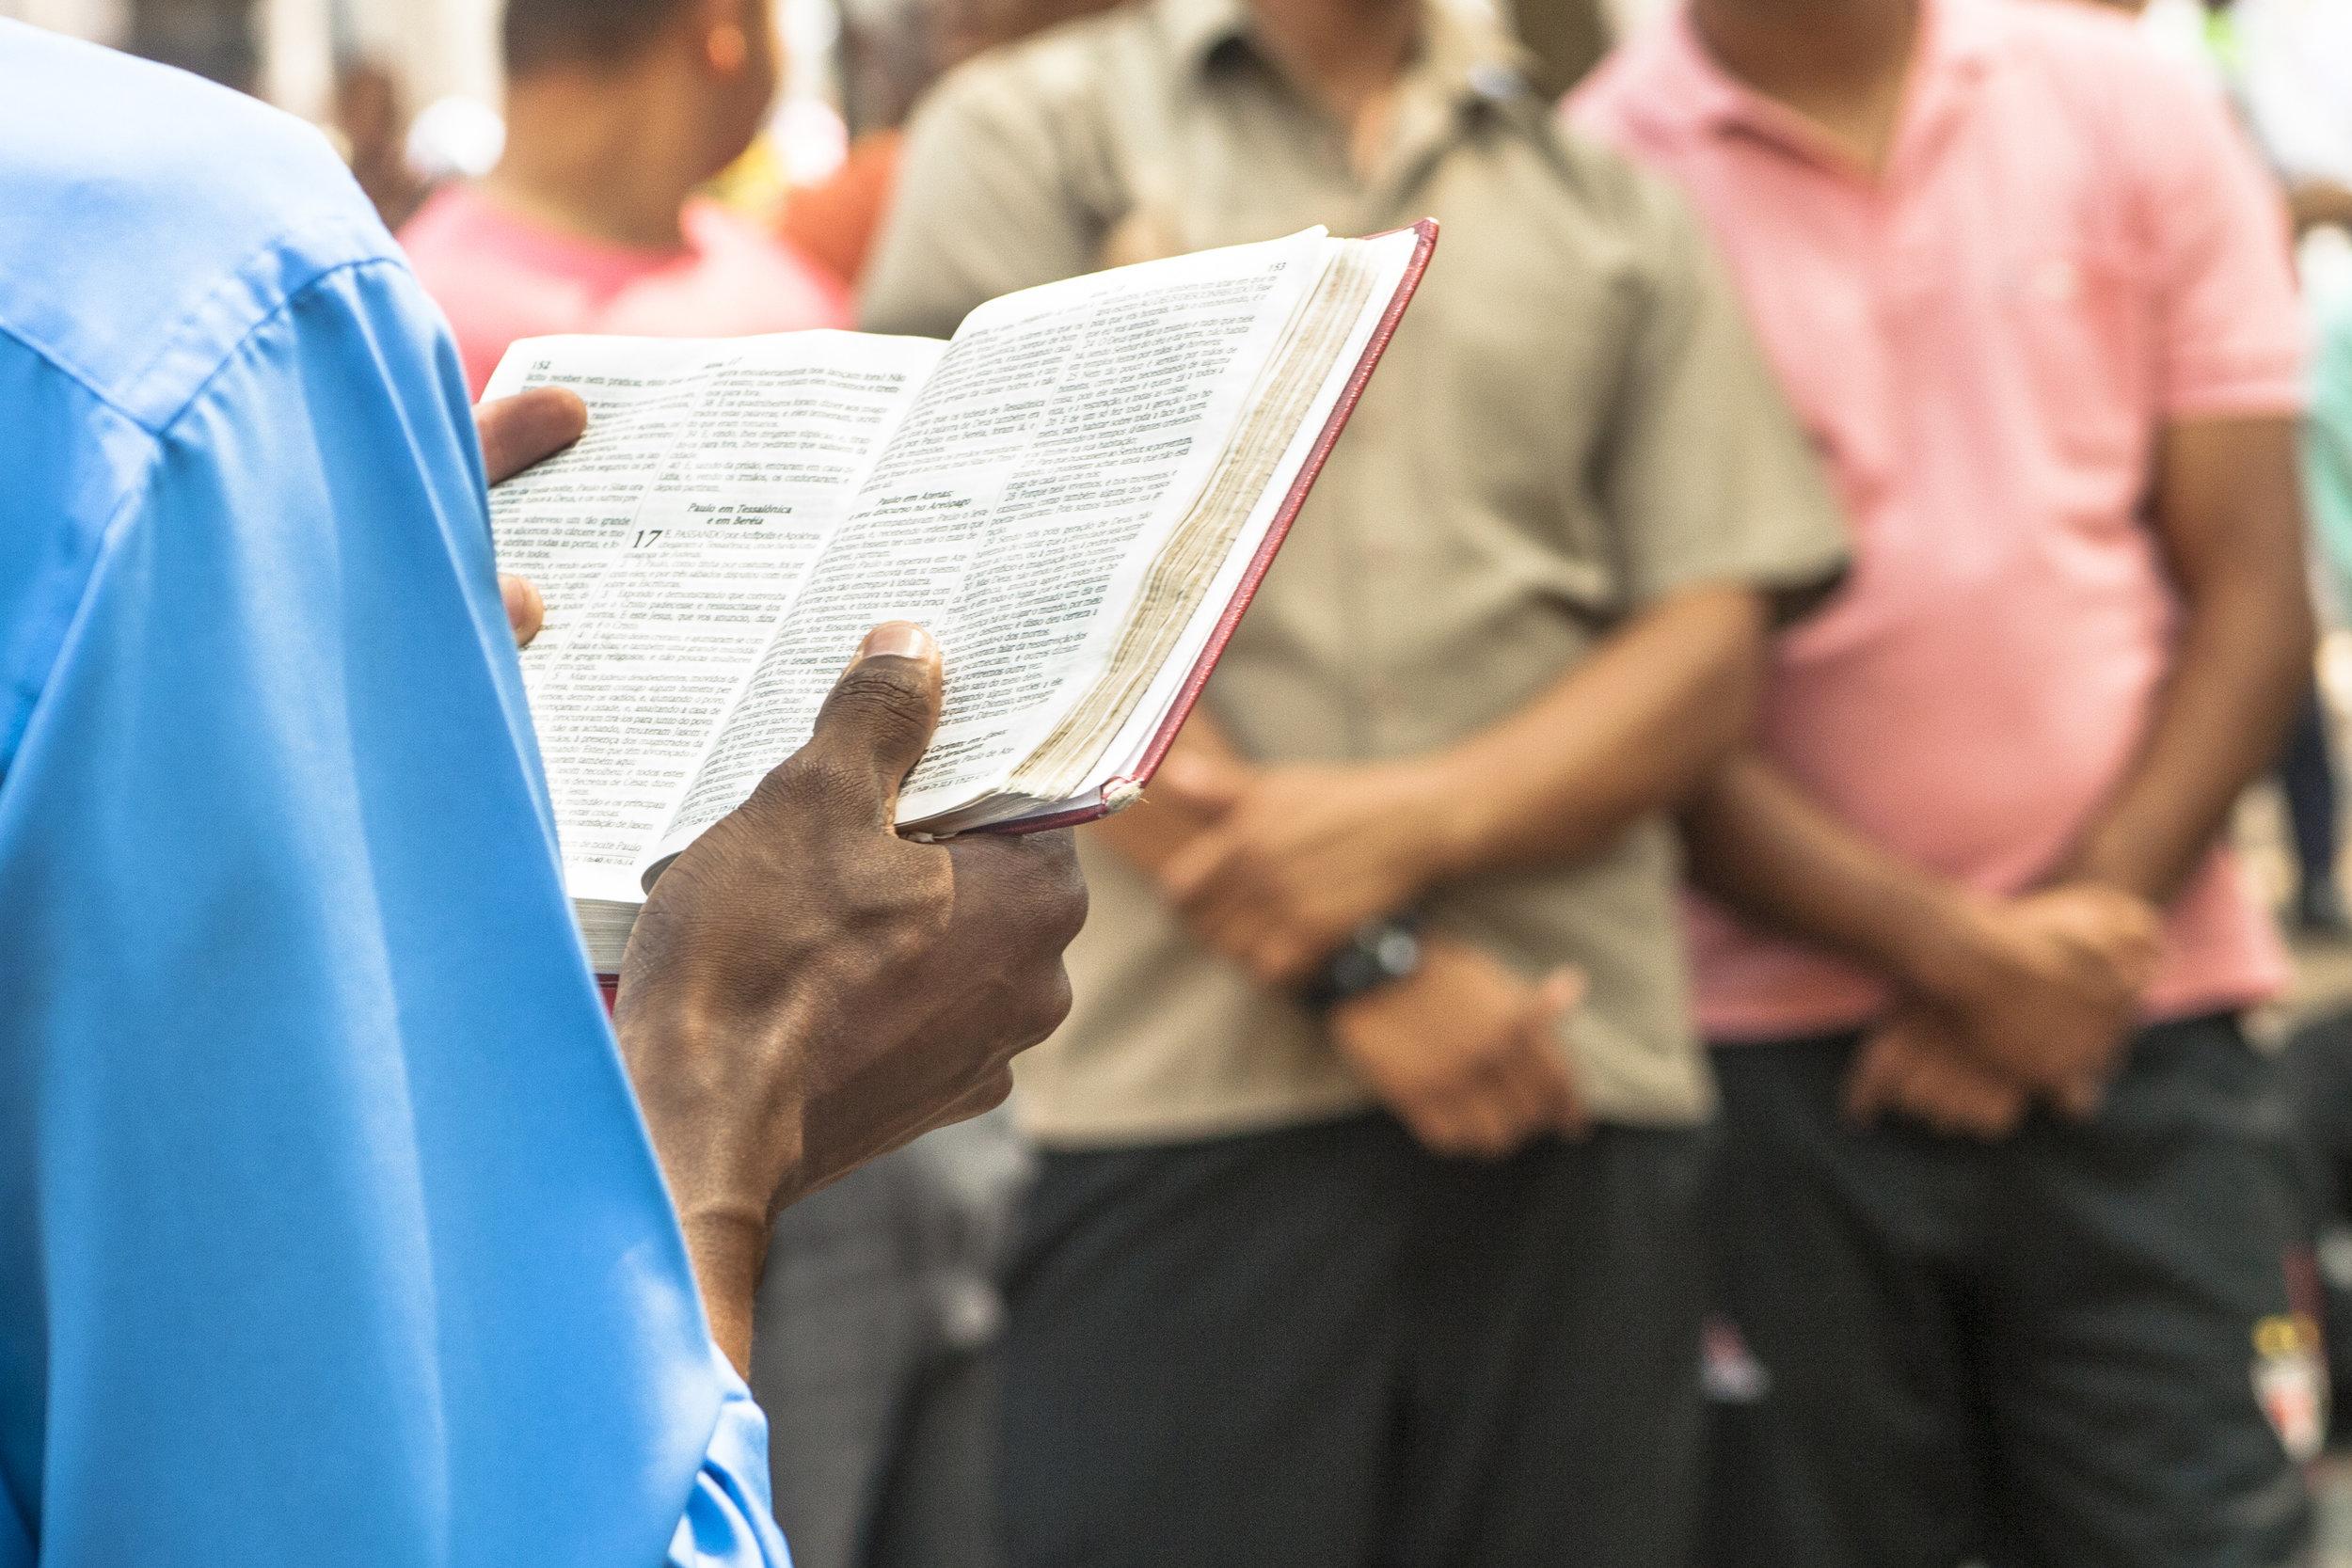 evangelism -